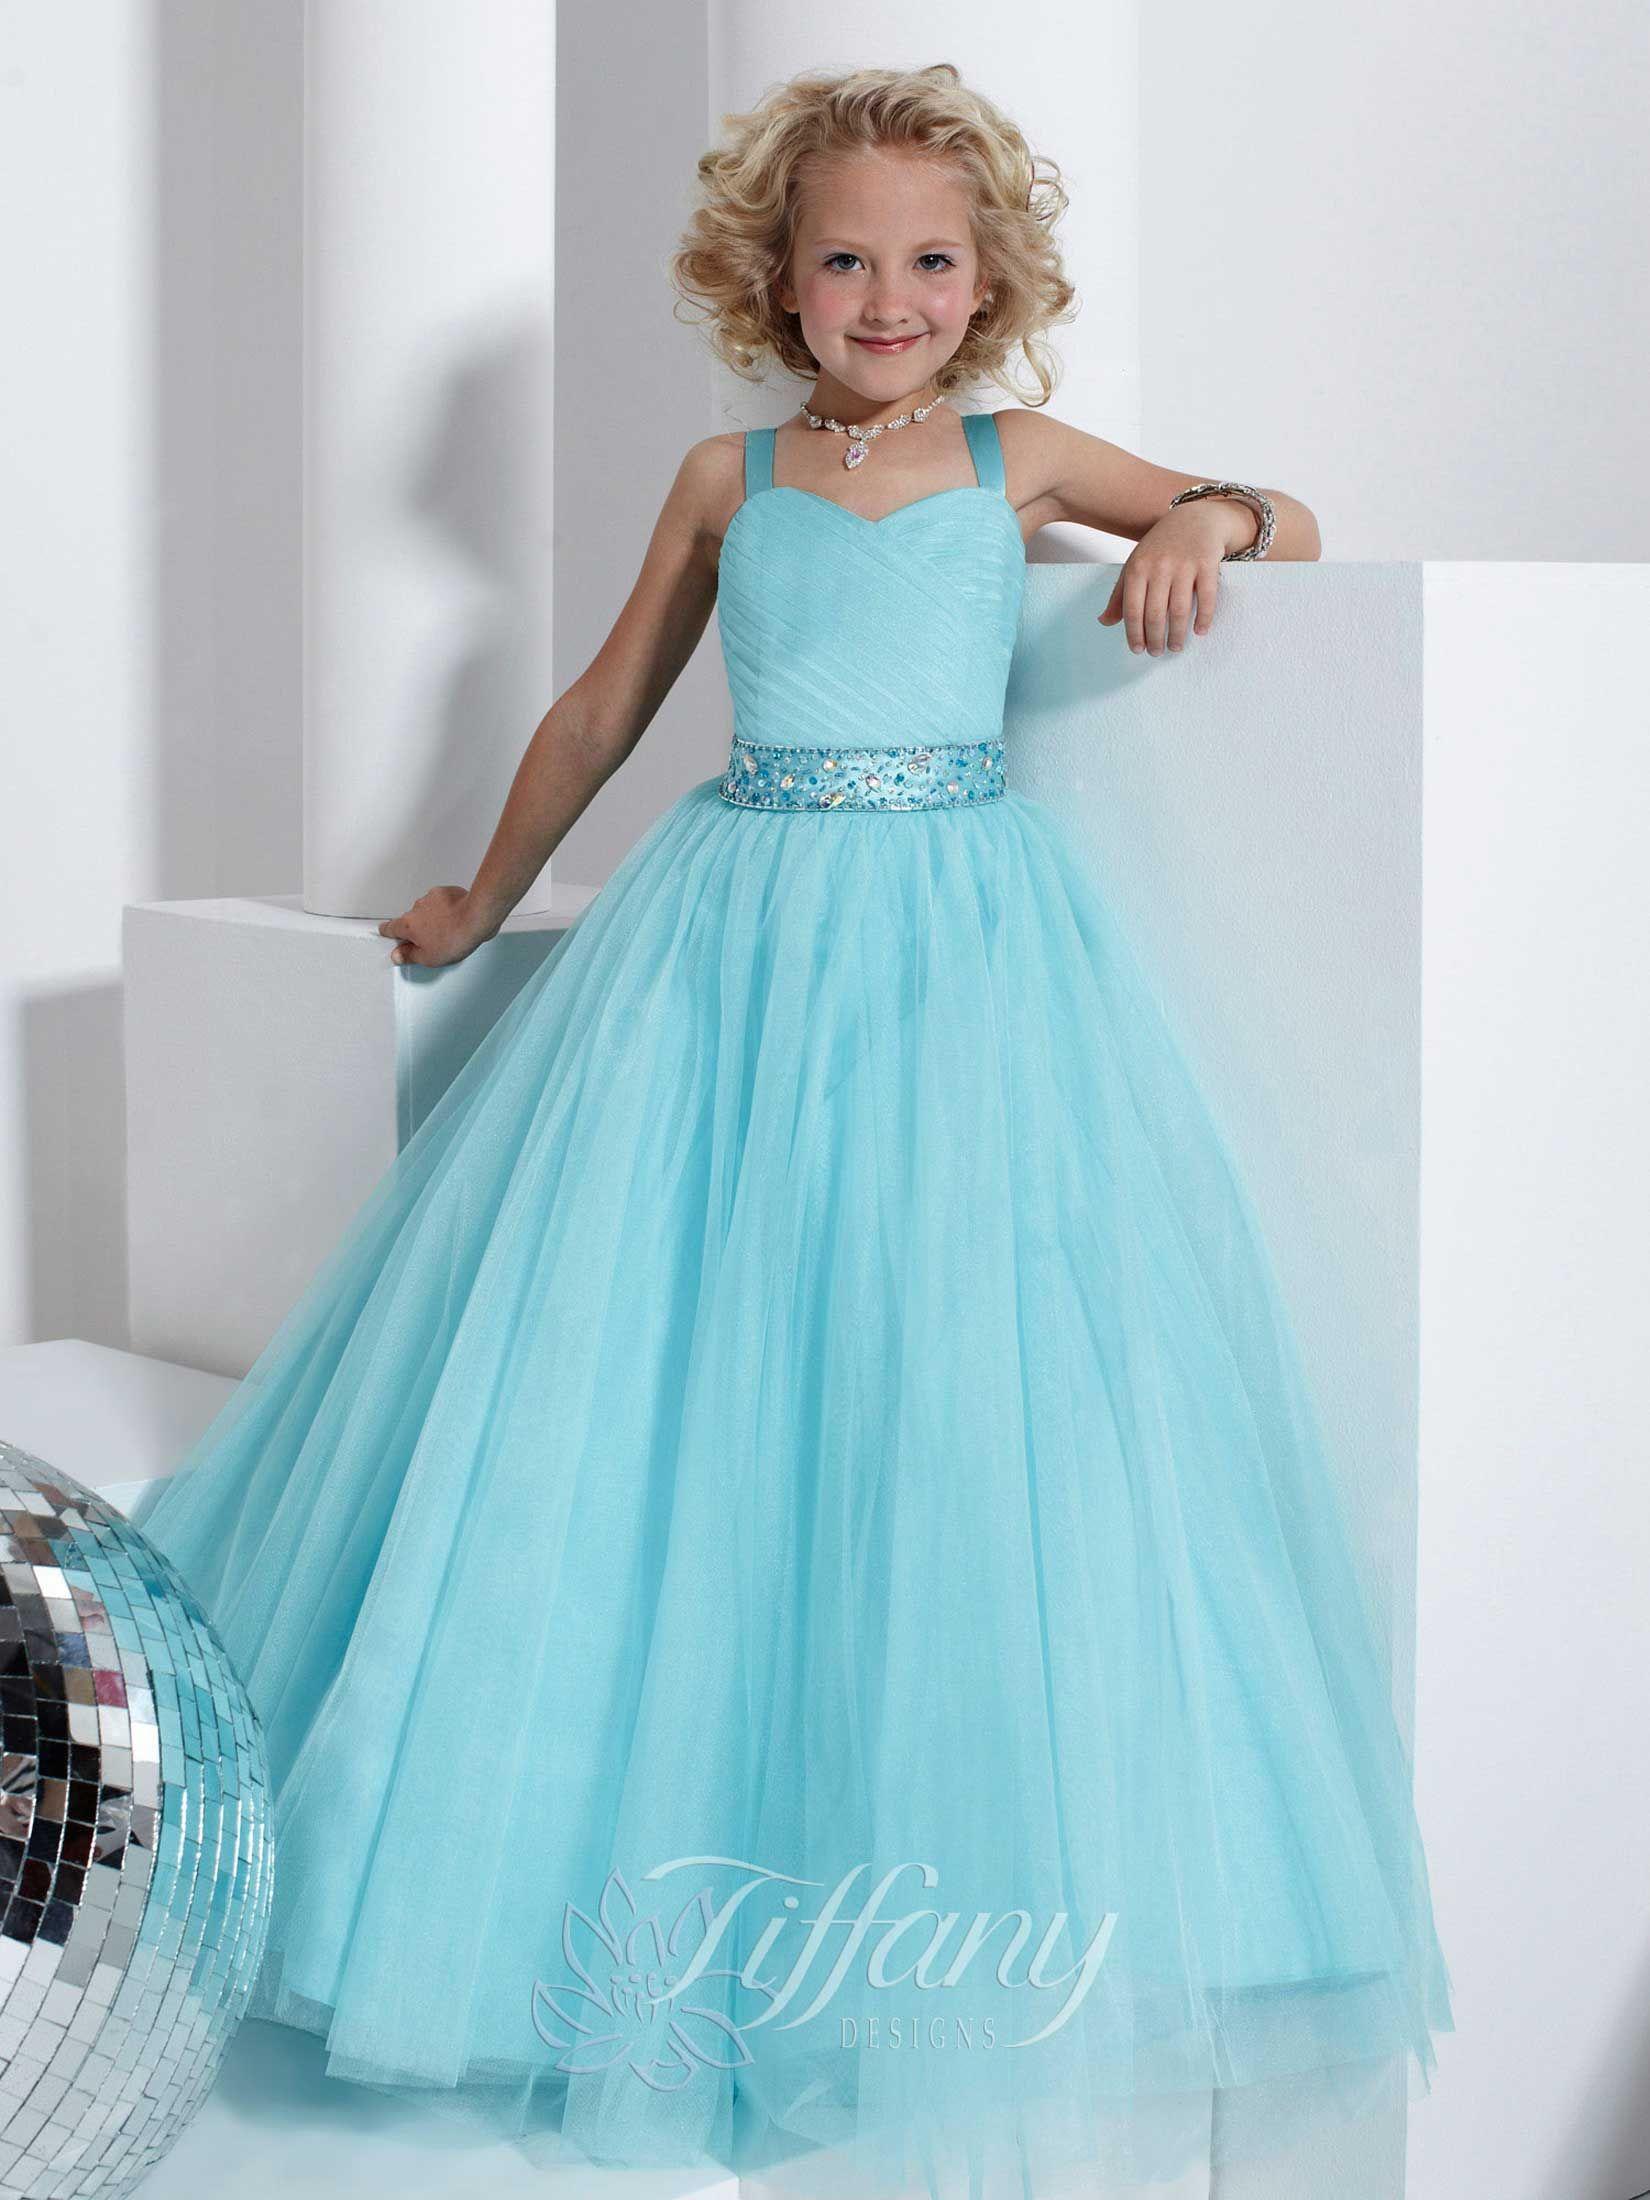 tiffany blue flower girl dresses - Google Search | Bridesmaid ...